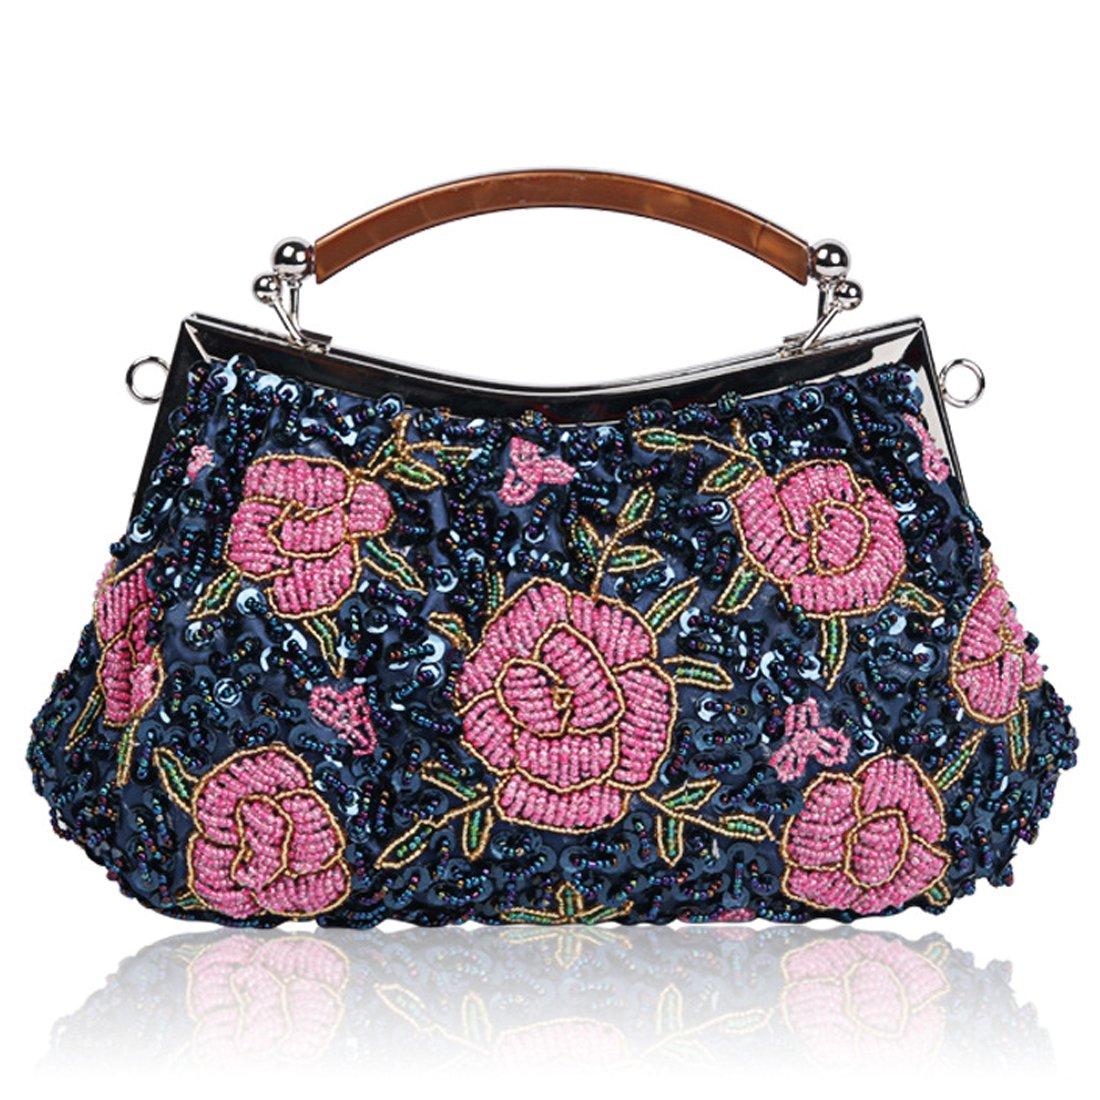 Floral Evening Bags for Women Chic Glass Beaded Flower Clutch Wedding Prom Bride Handbag Purse (Silver black 01)